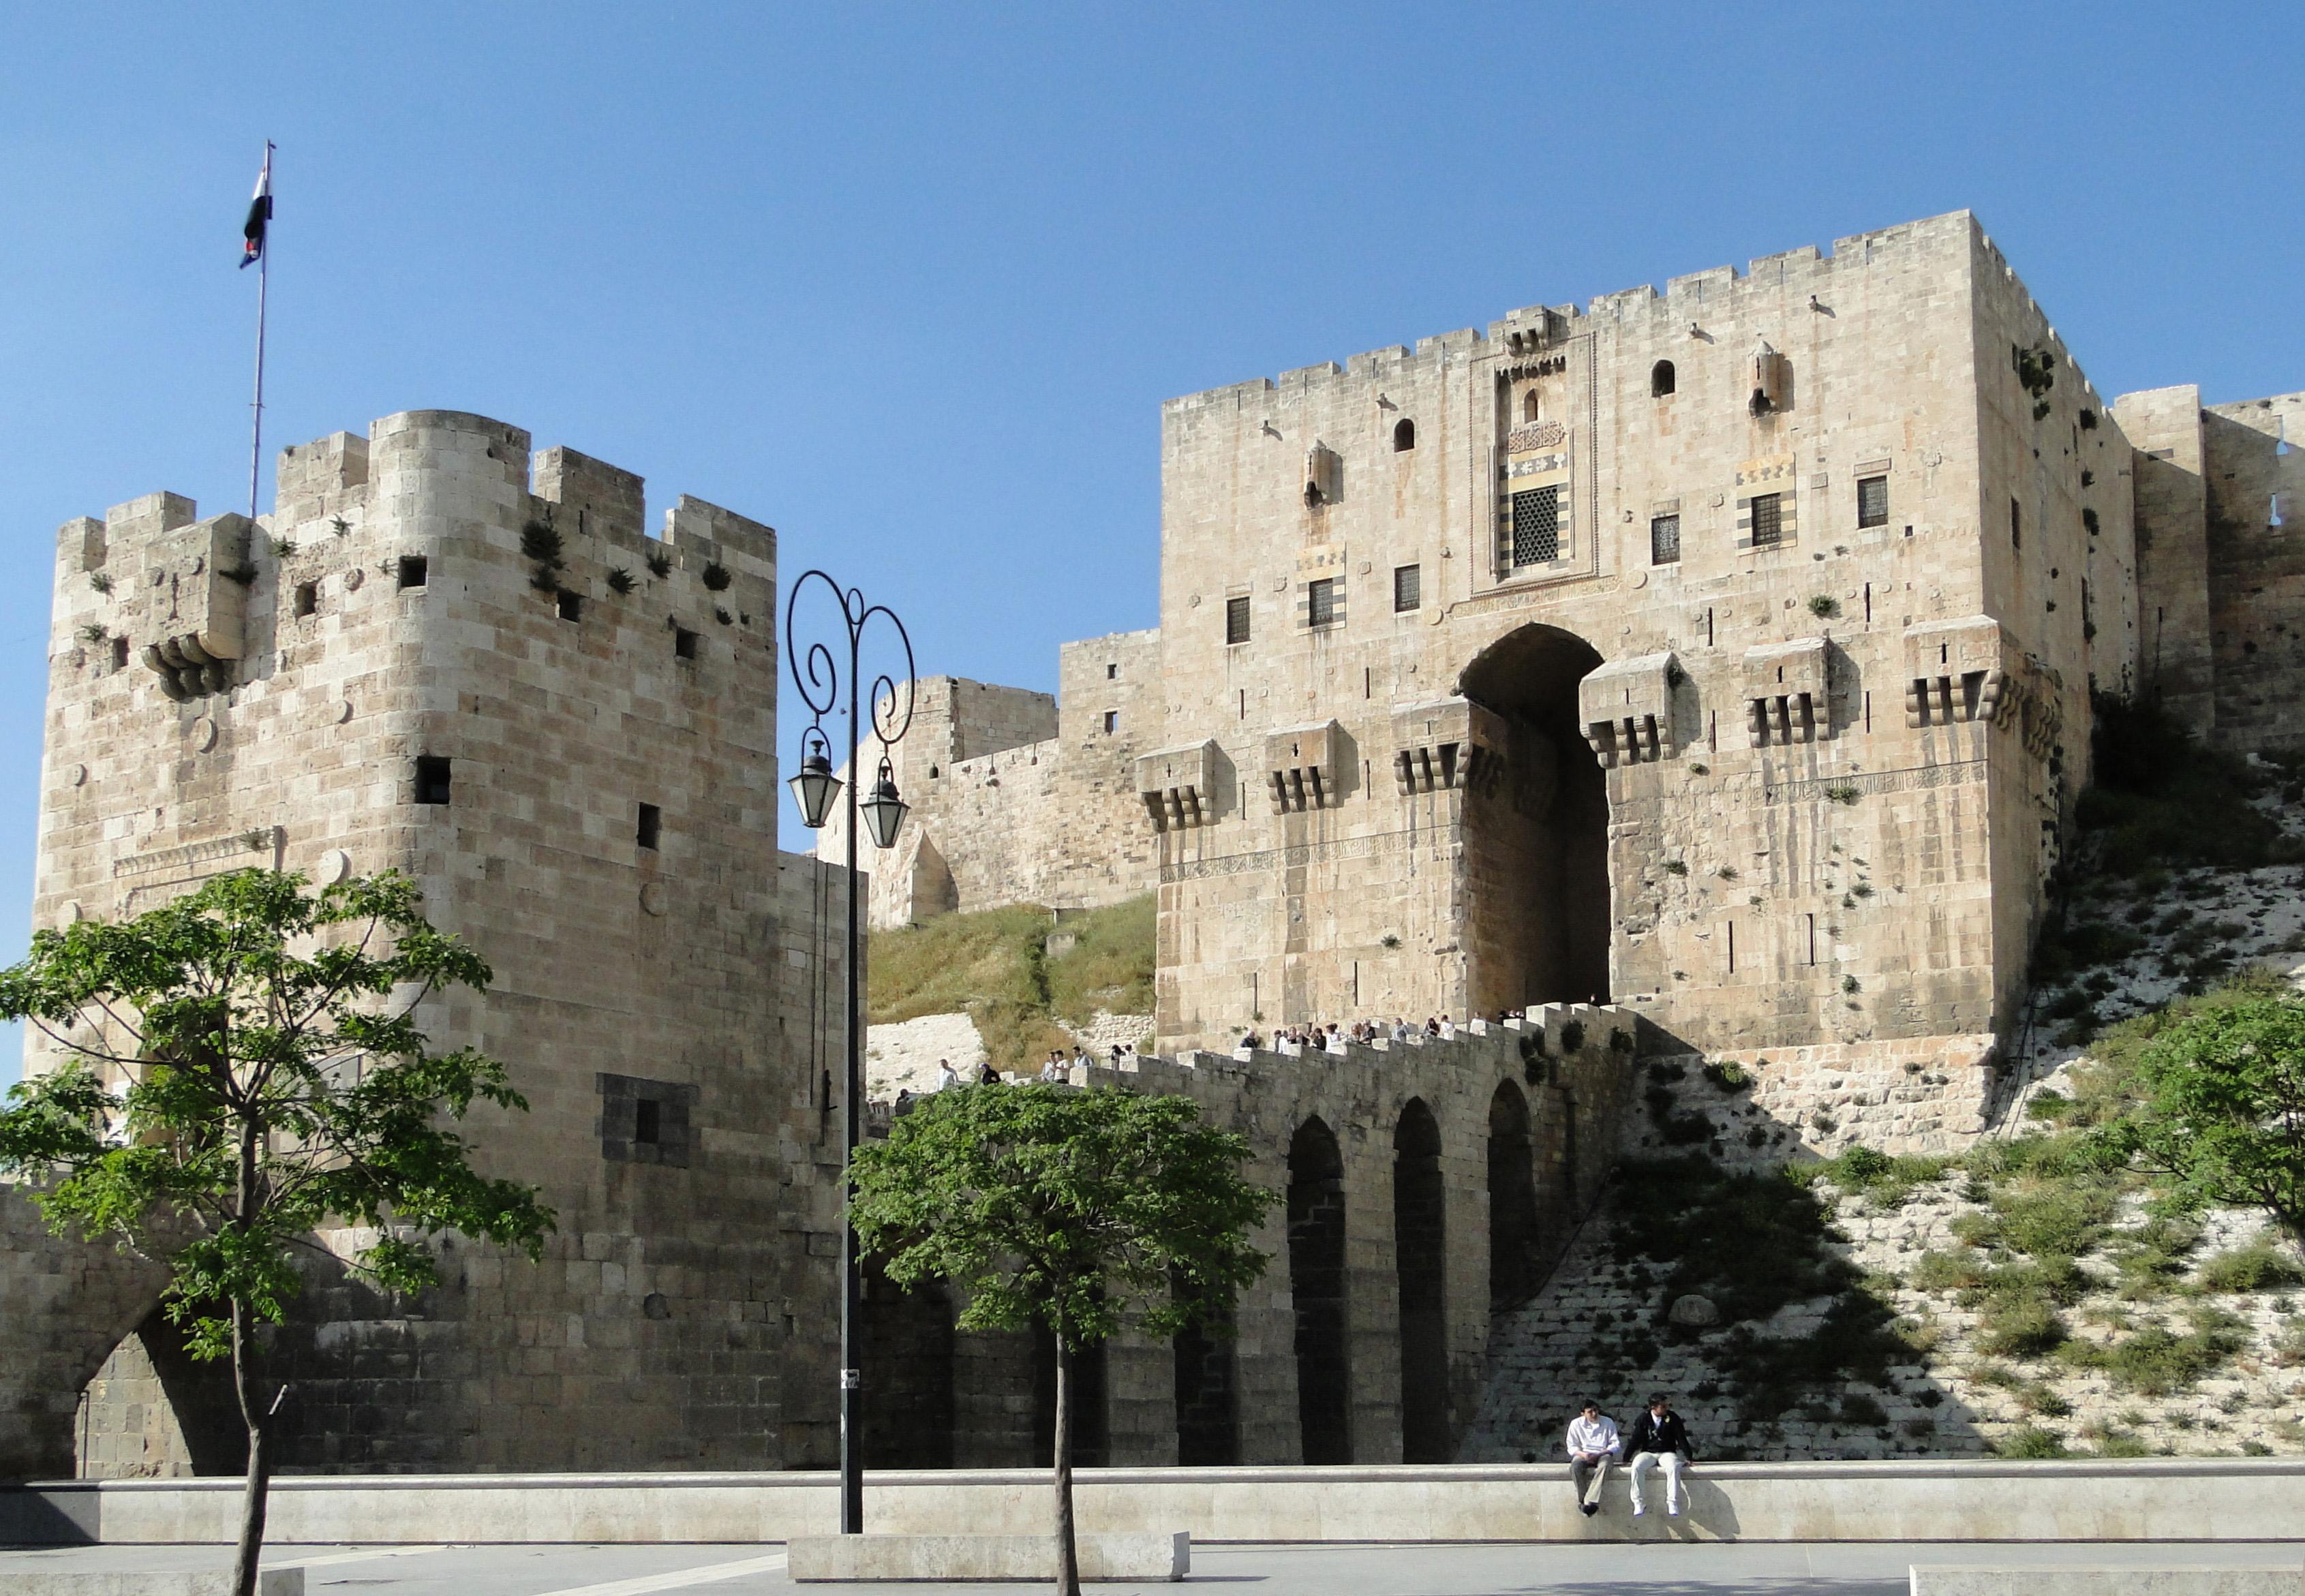 Файл:Aleppo Citadel 04.jpg — Википедия